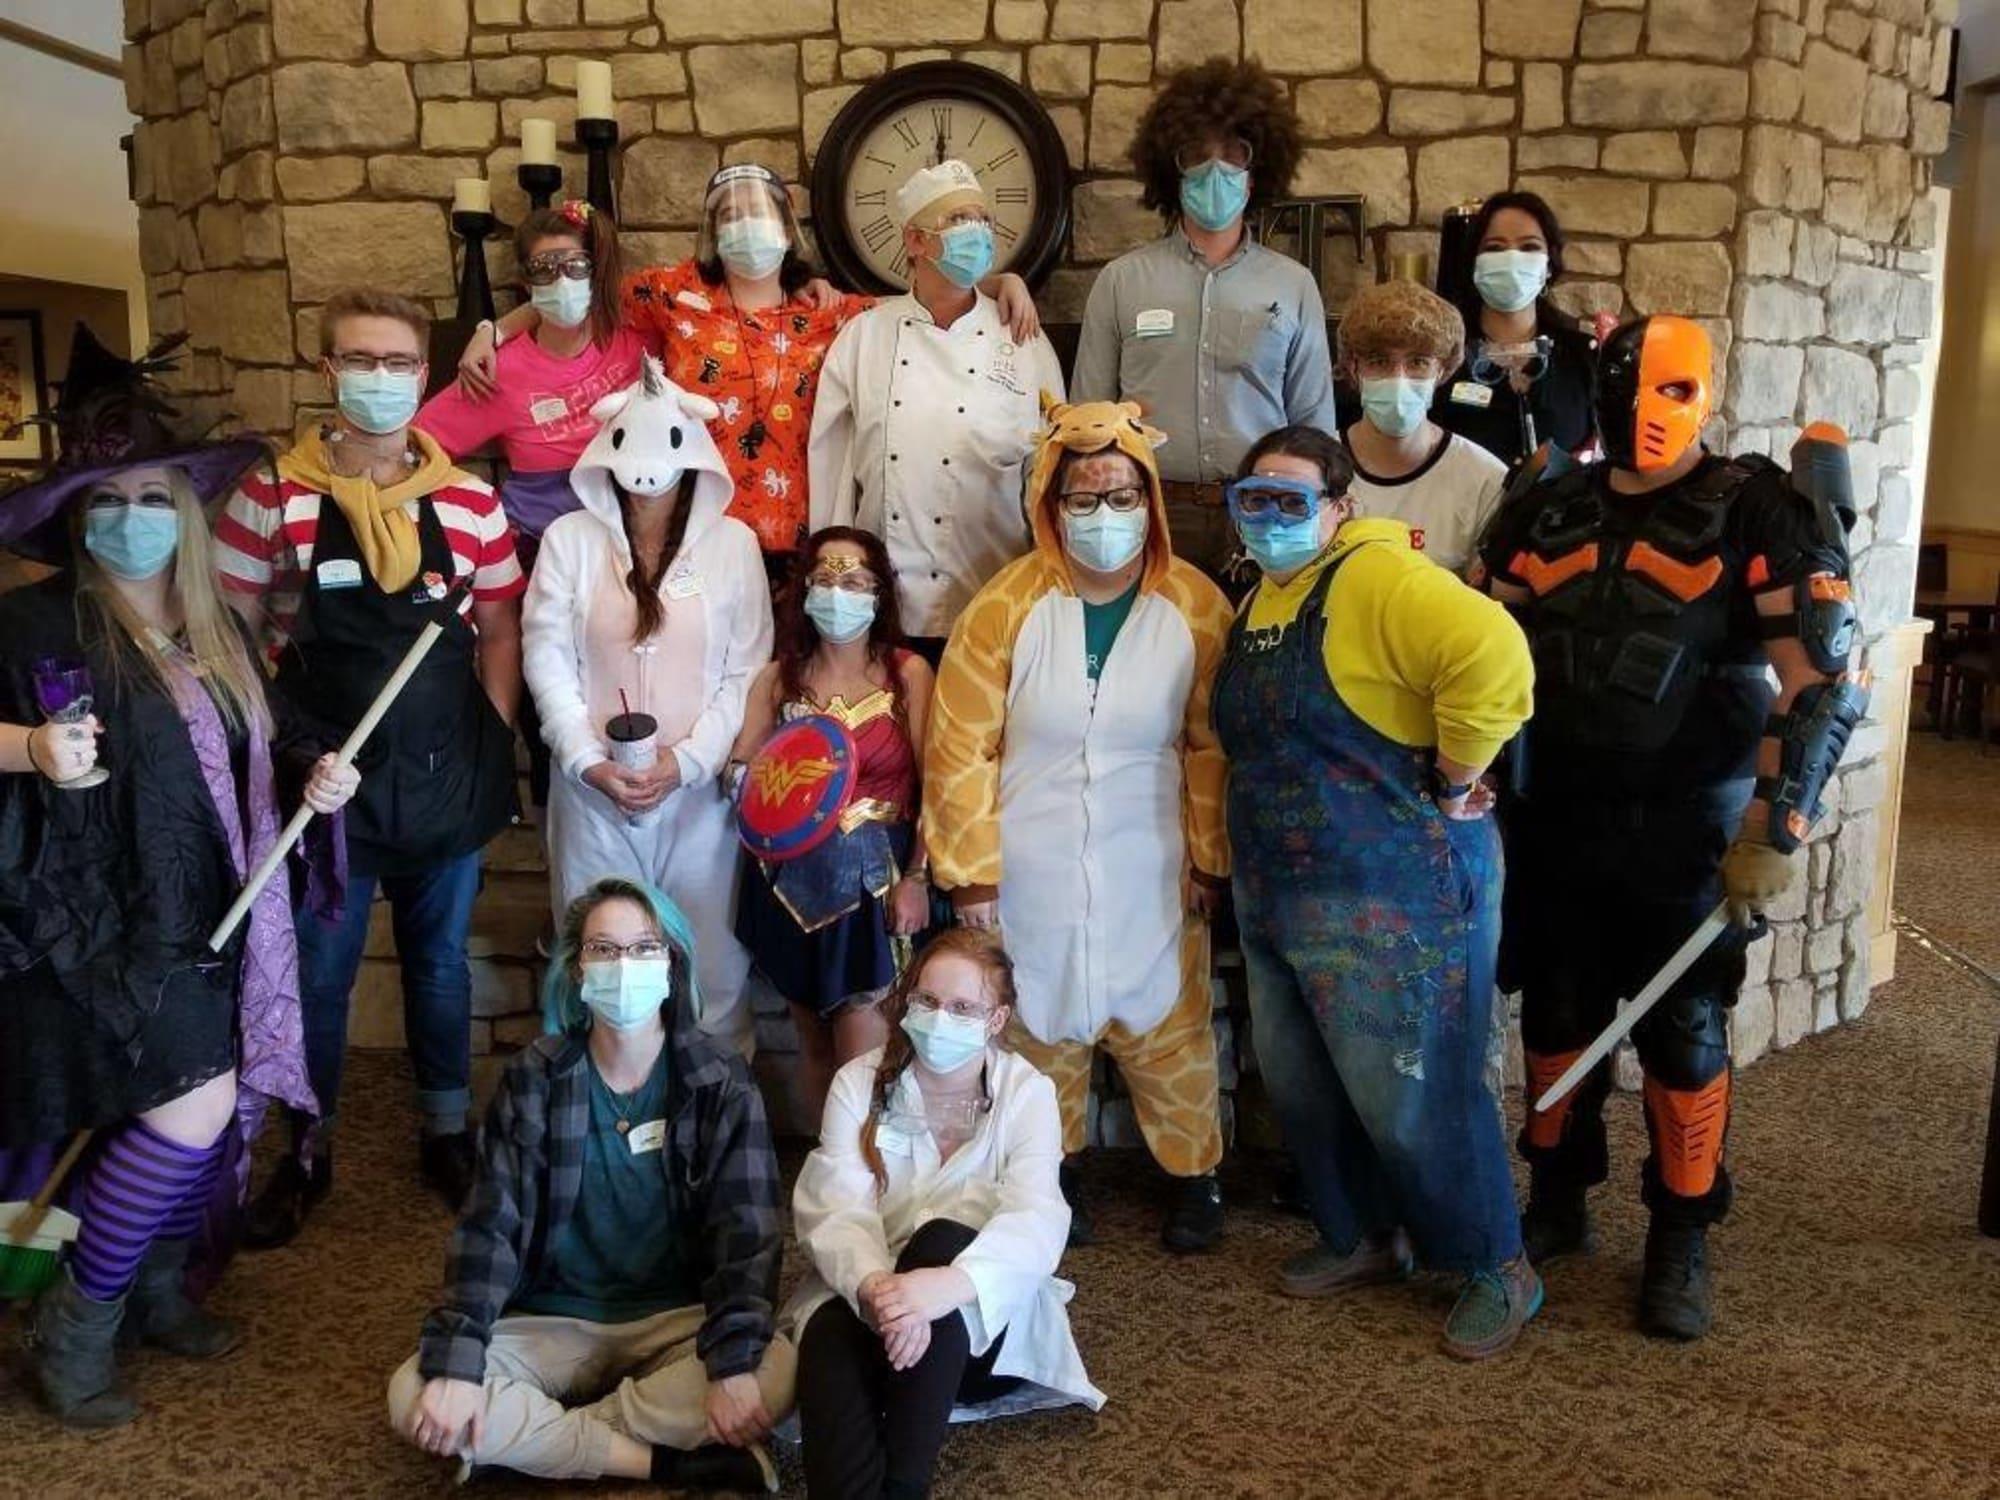 Halloween costumes at Crystal Terrace of Klamath Falls in Klamath Falls, OR